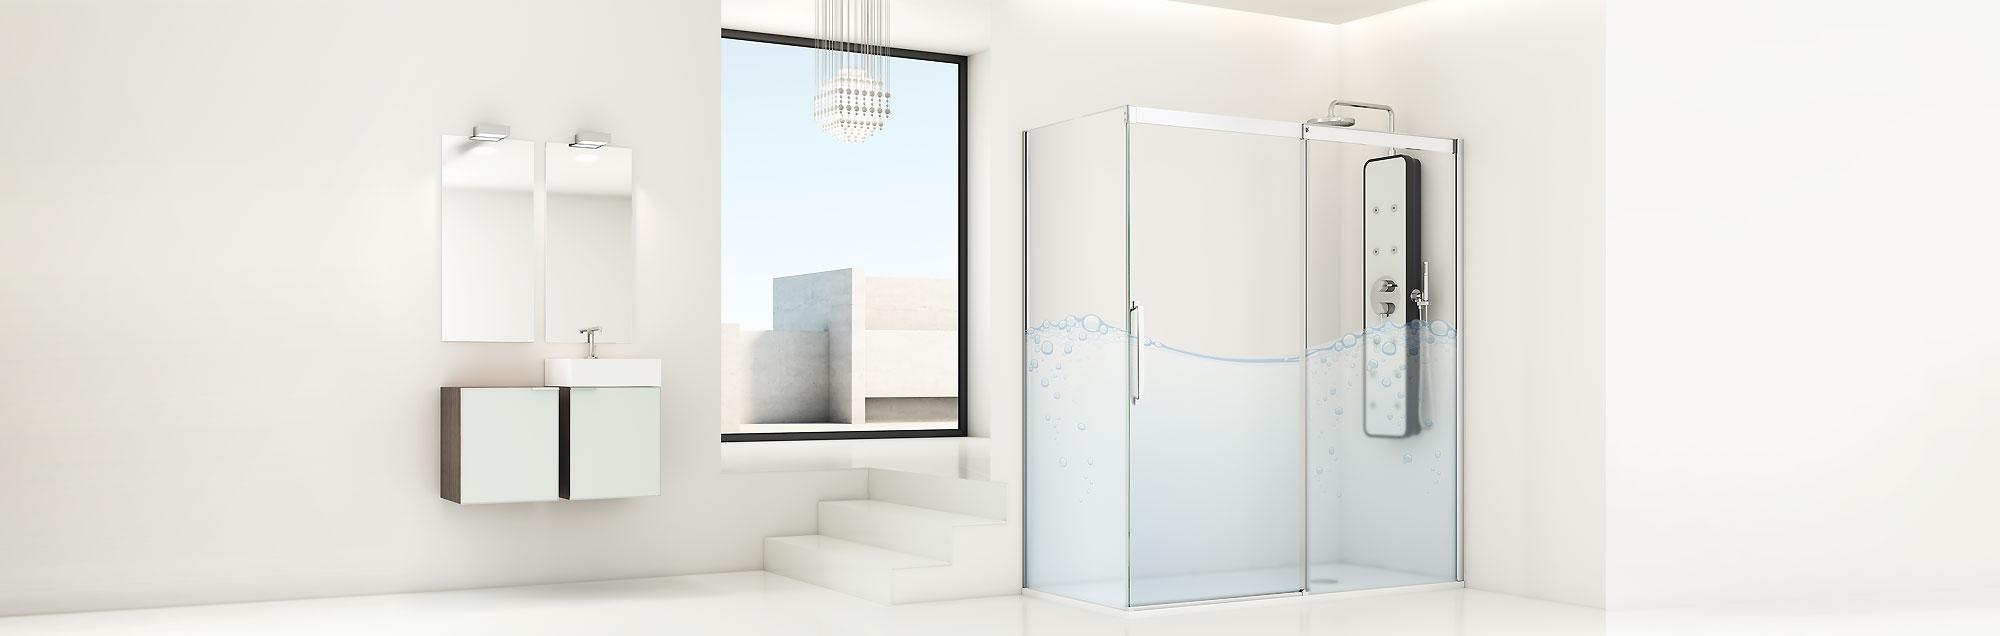 Serie Smart/Vita de mamparas correderas de baño a medida